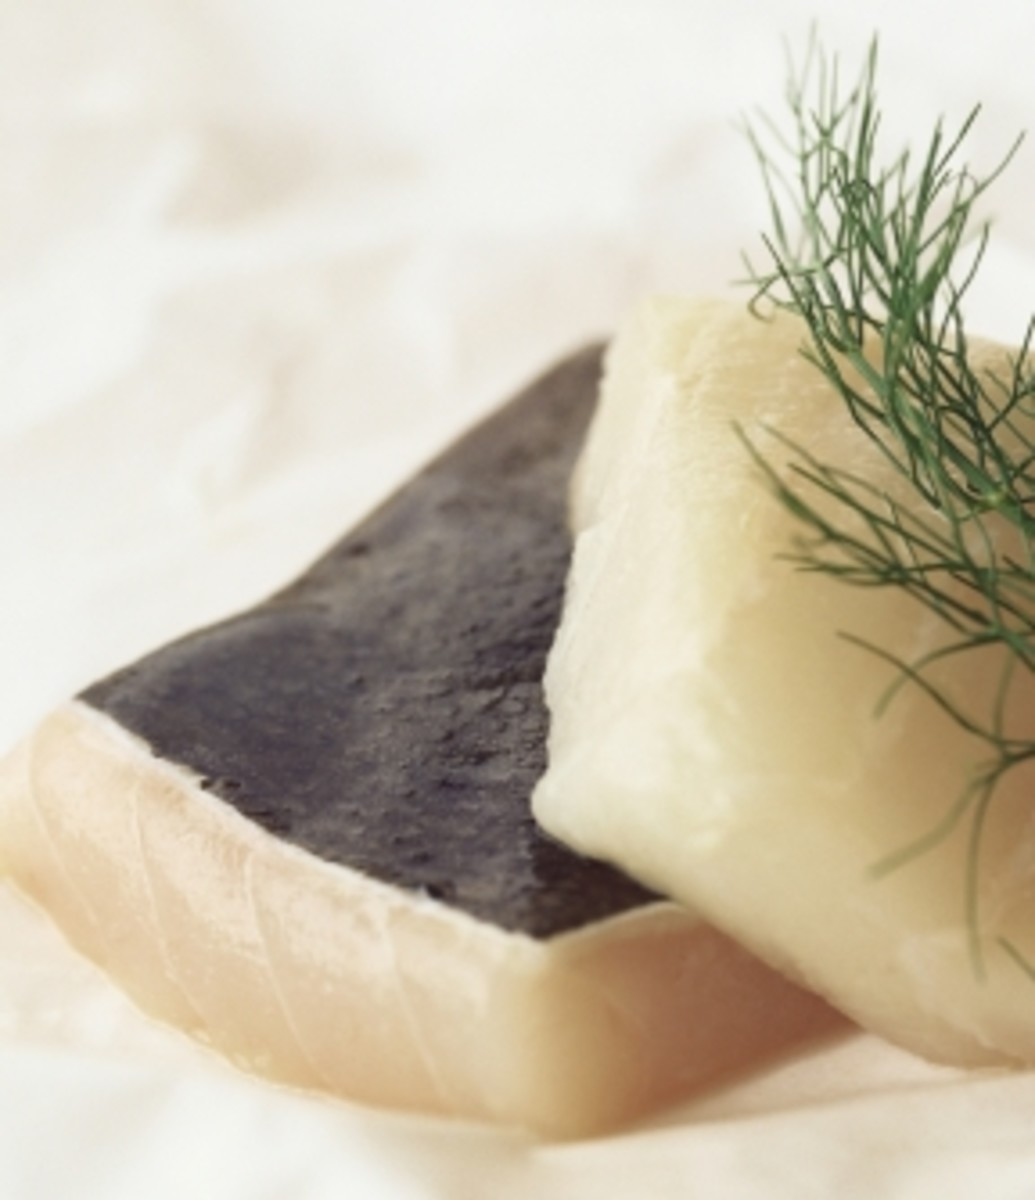 5-health-benefits-of-white-fish